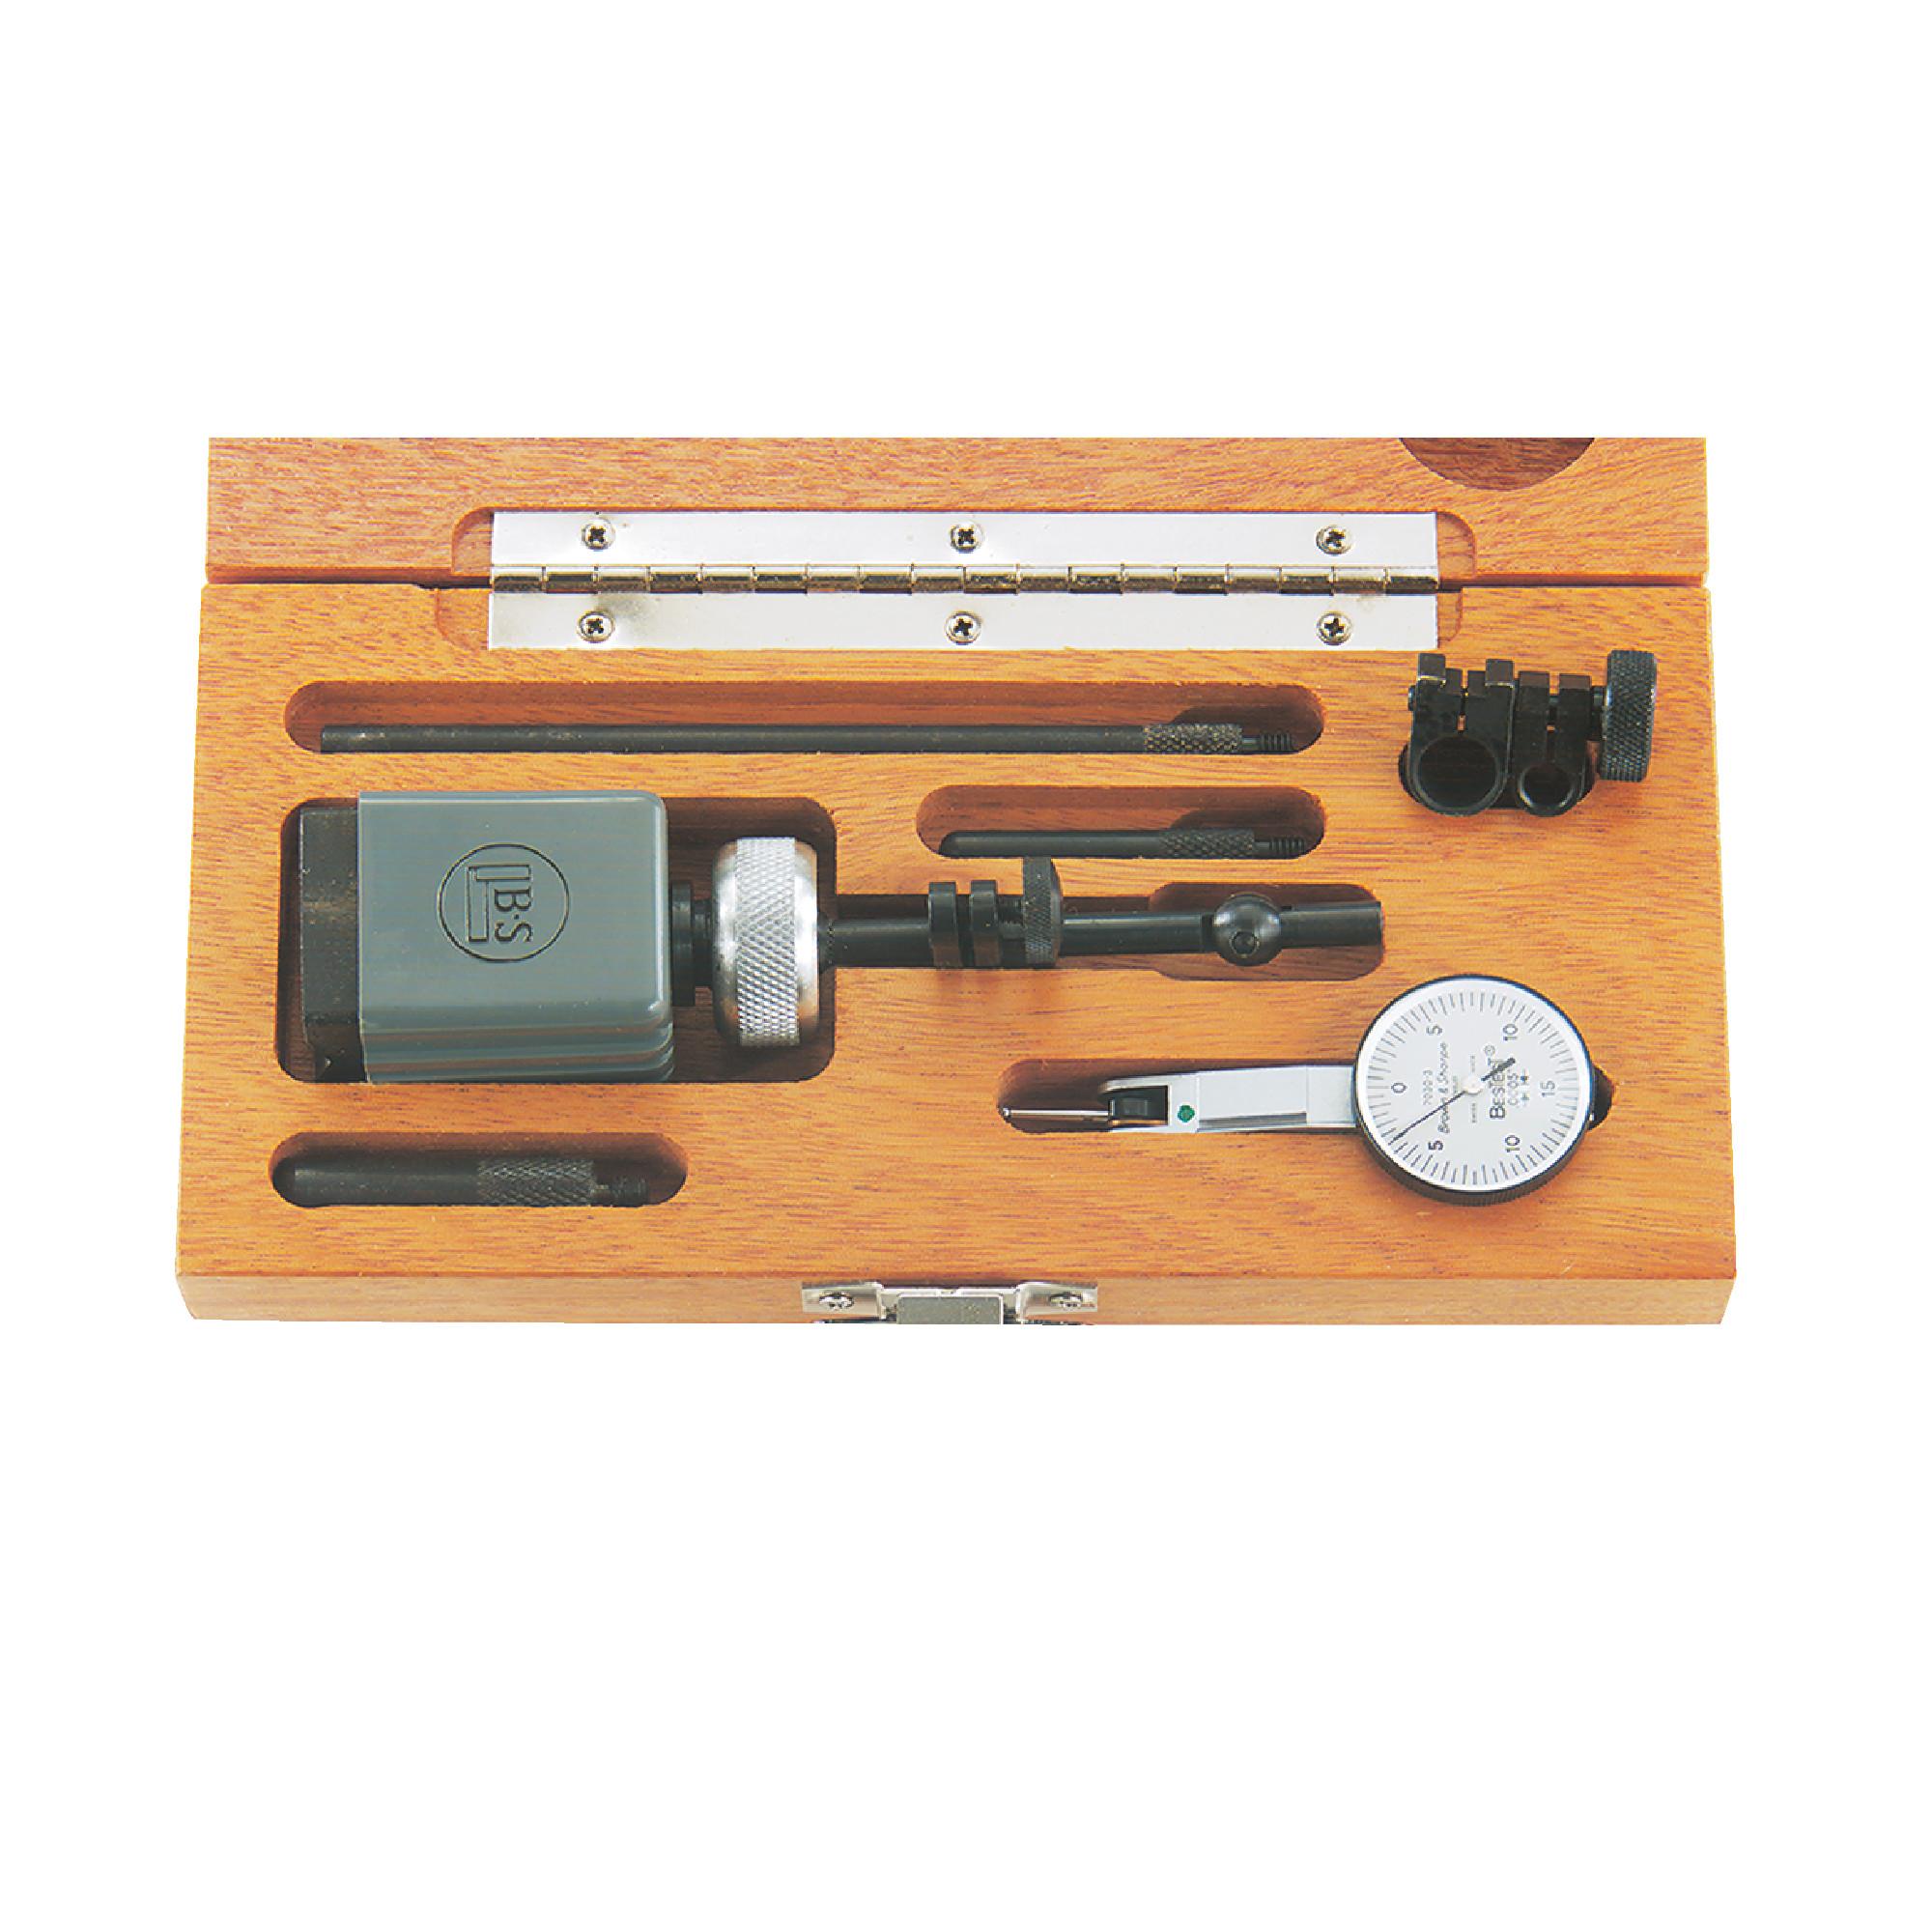 Miti-Mite Magnetic Base & BesTest® Indicator Set